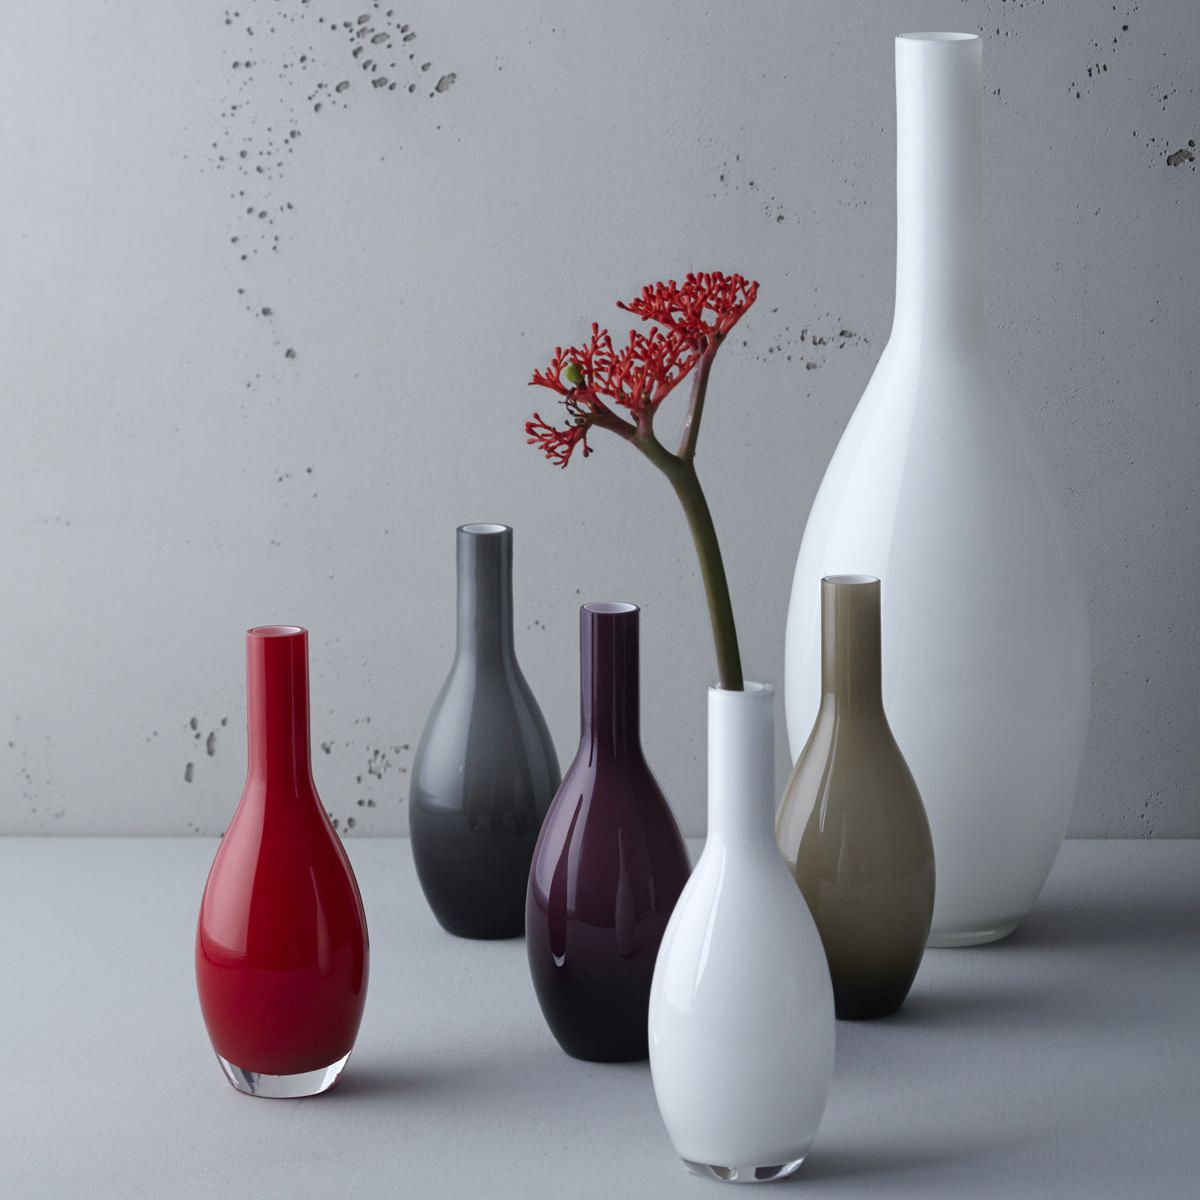 Leonardo Vase Beauty 50cm gruen N 002.xxl3  - Vază Beauty red 50 cm (L058726)